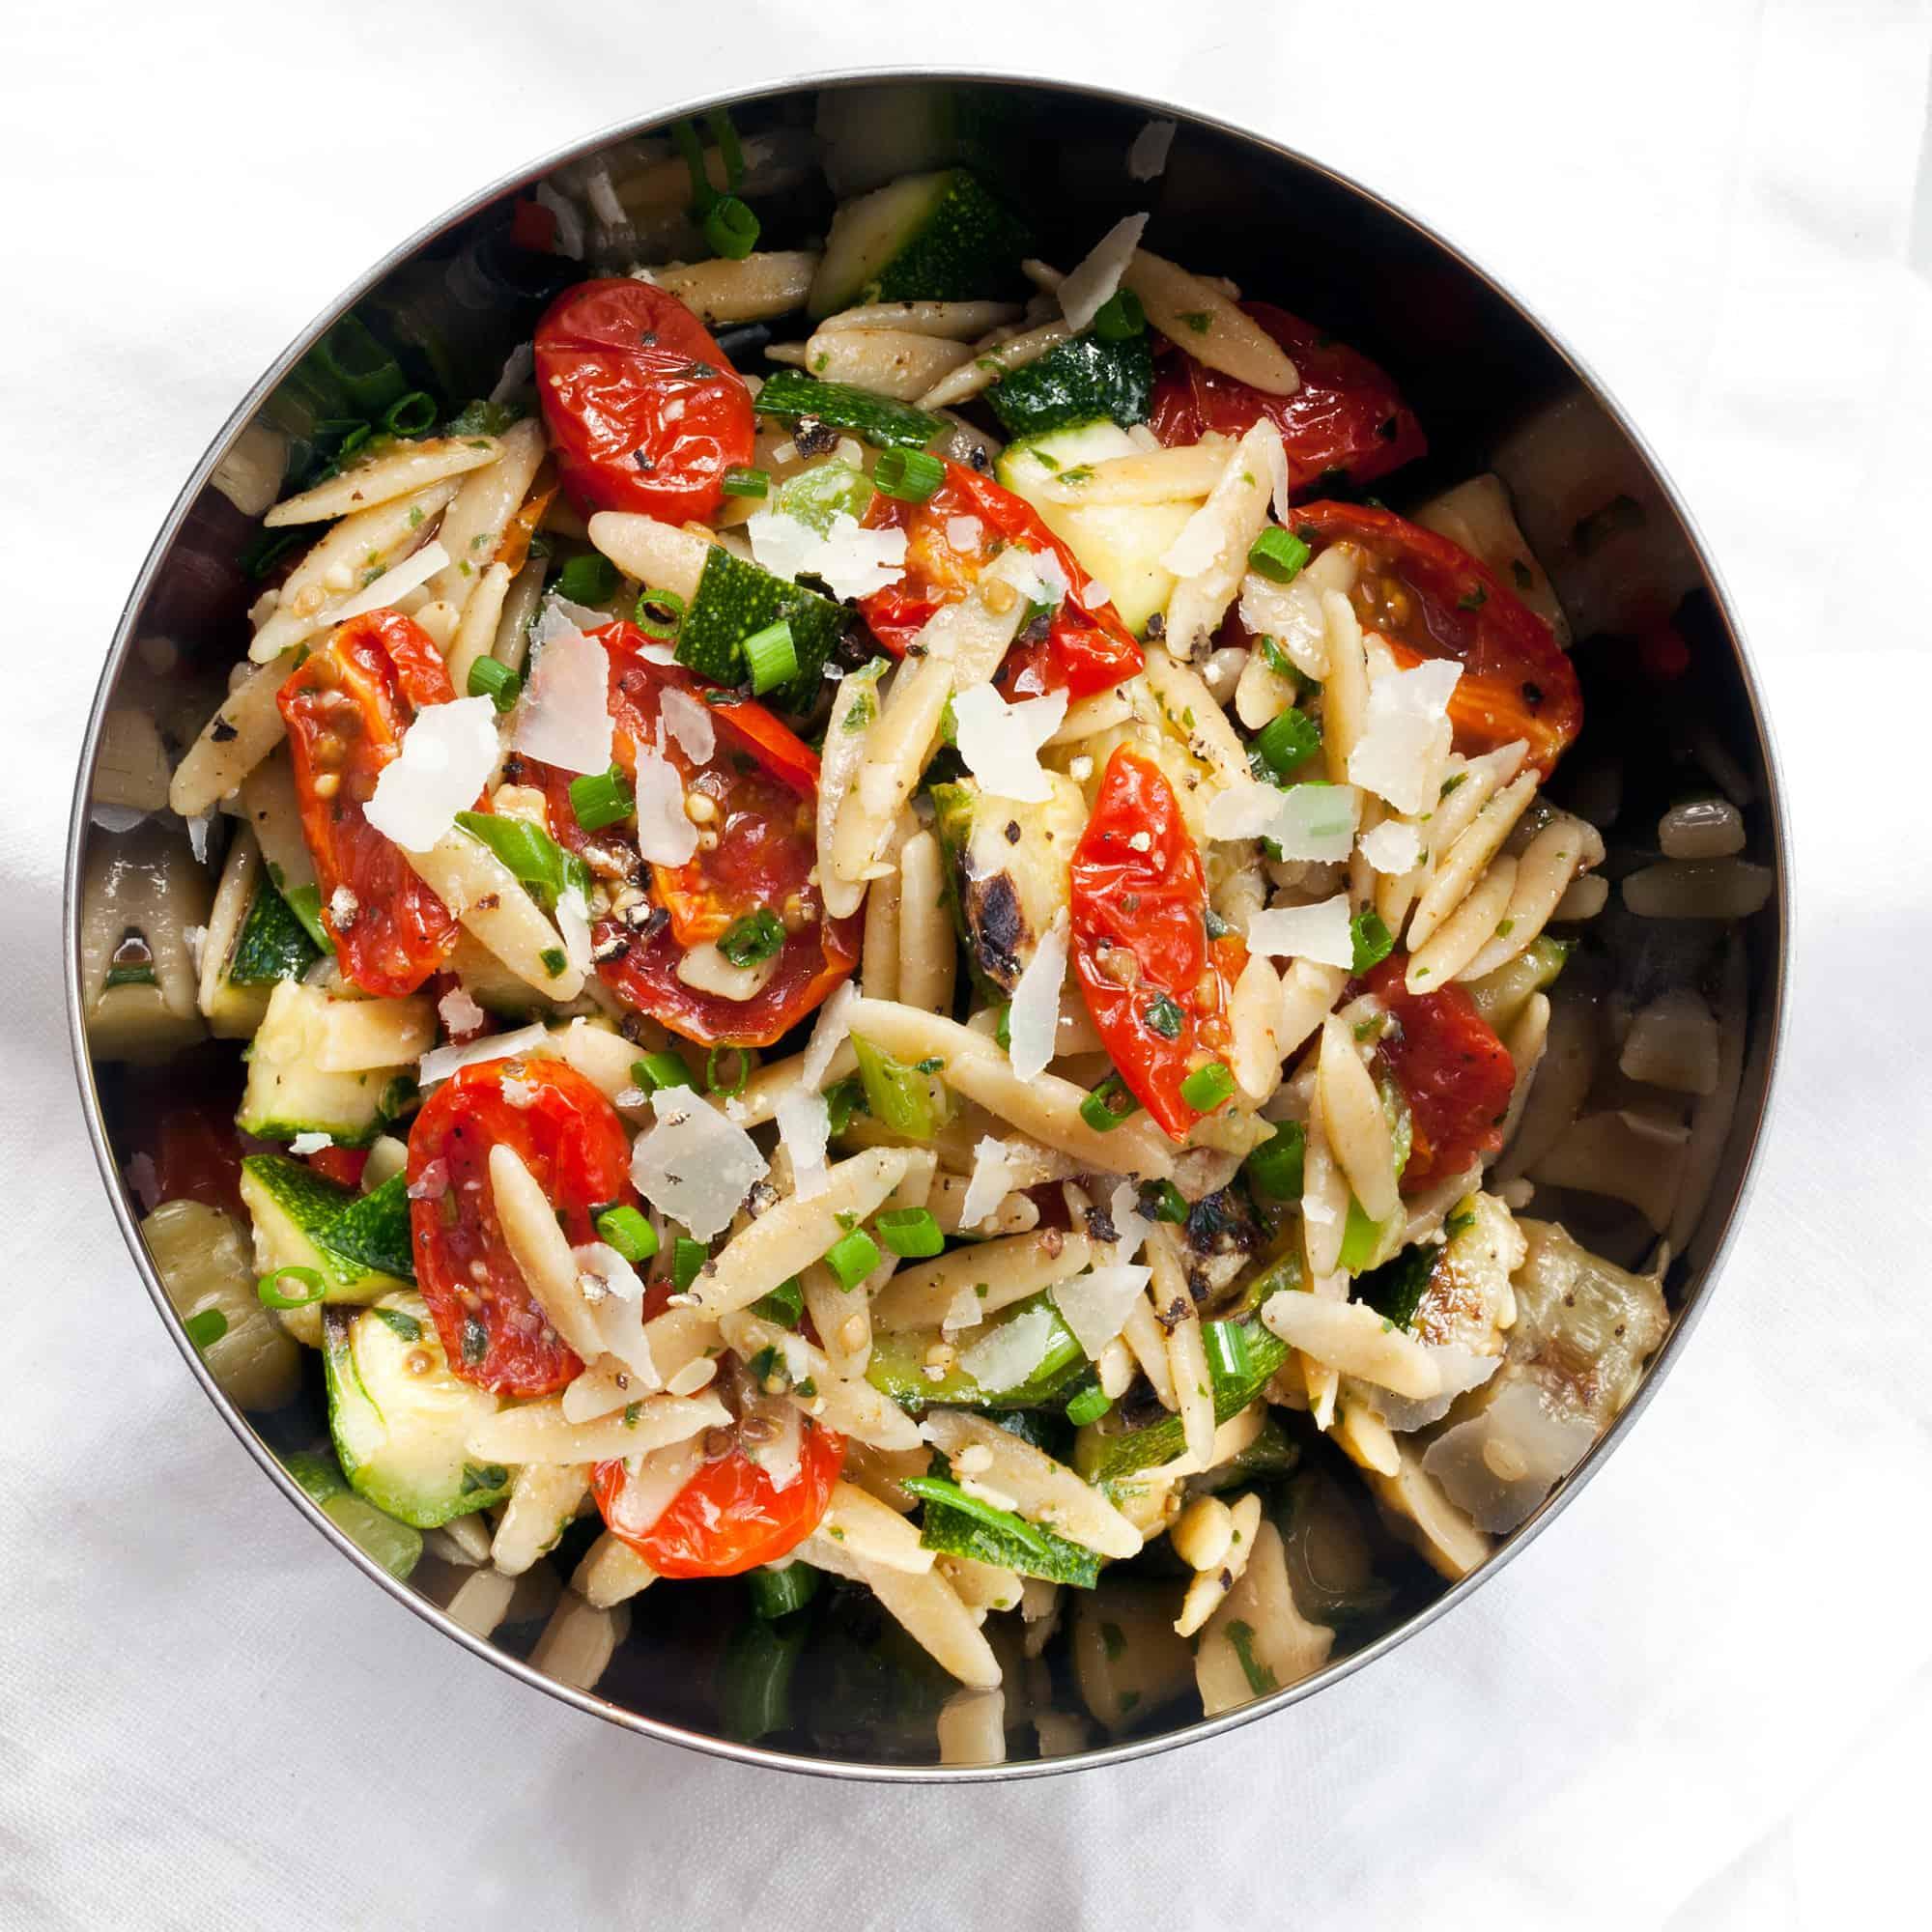 Slow-Roasted Tomato Zucchini Orzo